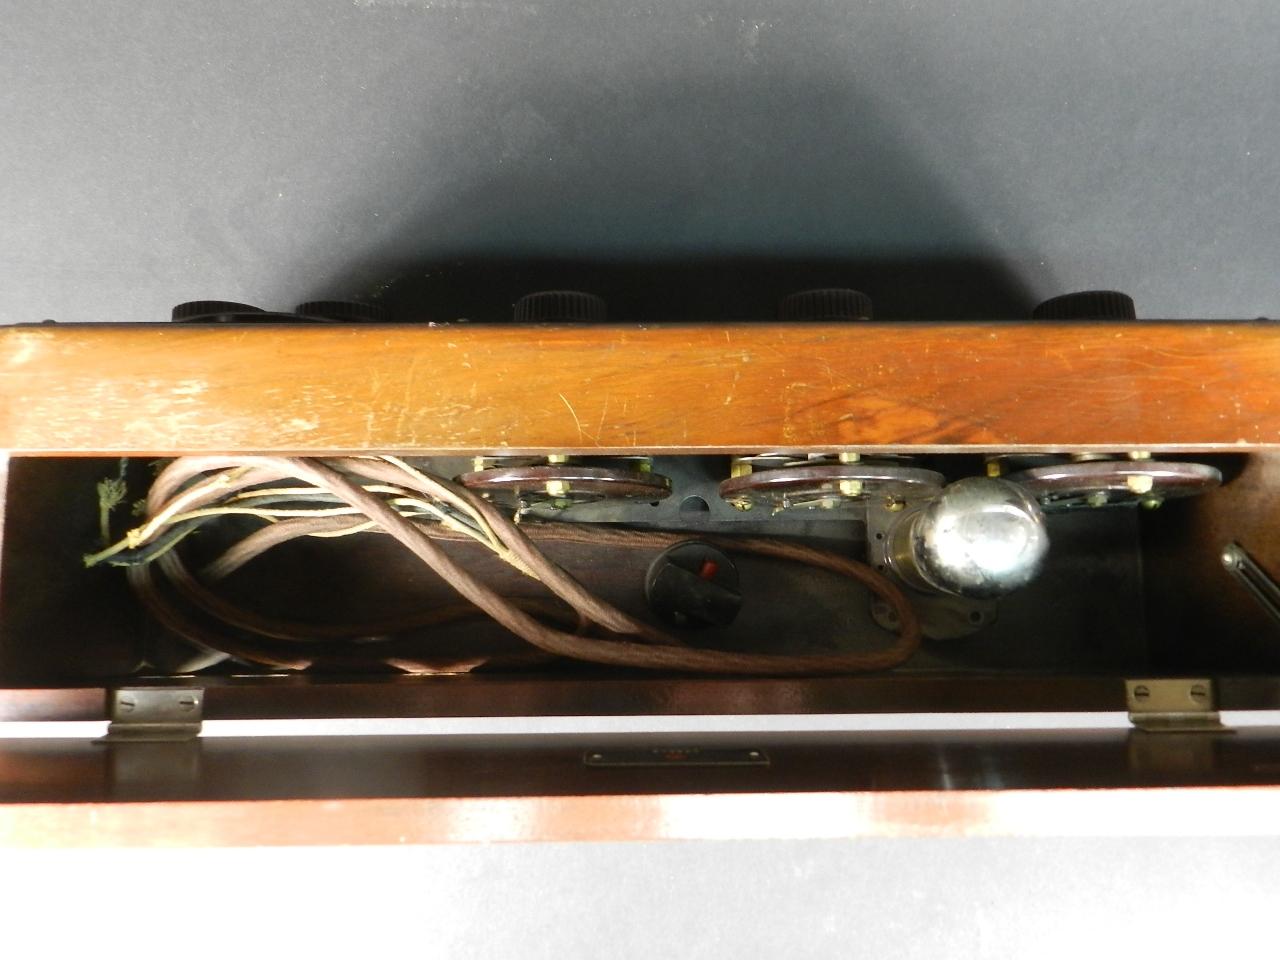 Imagen RADIO ATWATER KENT MODELO 20 + SPEAKER Mod.E 33064